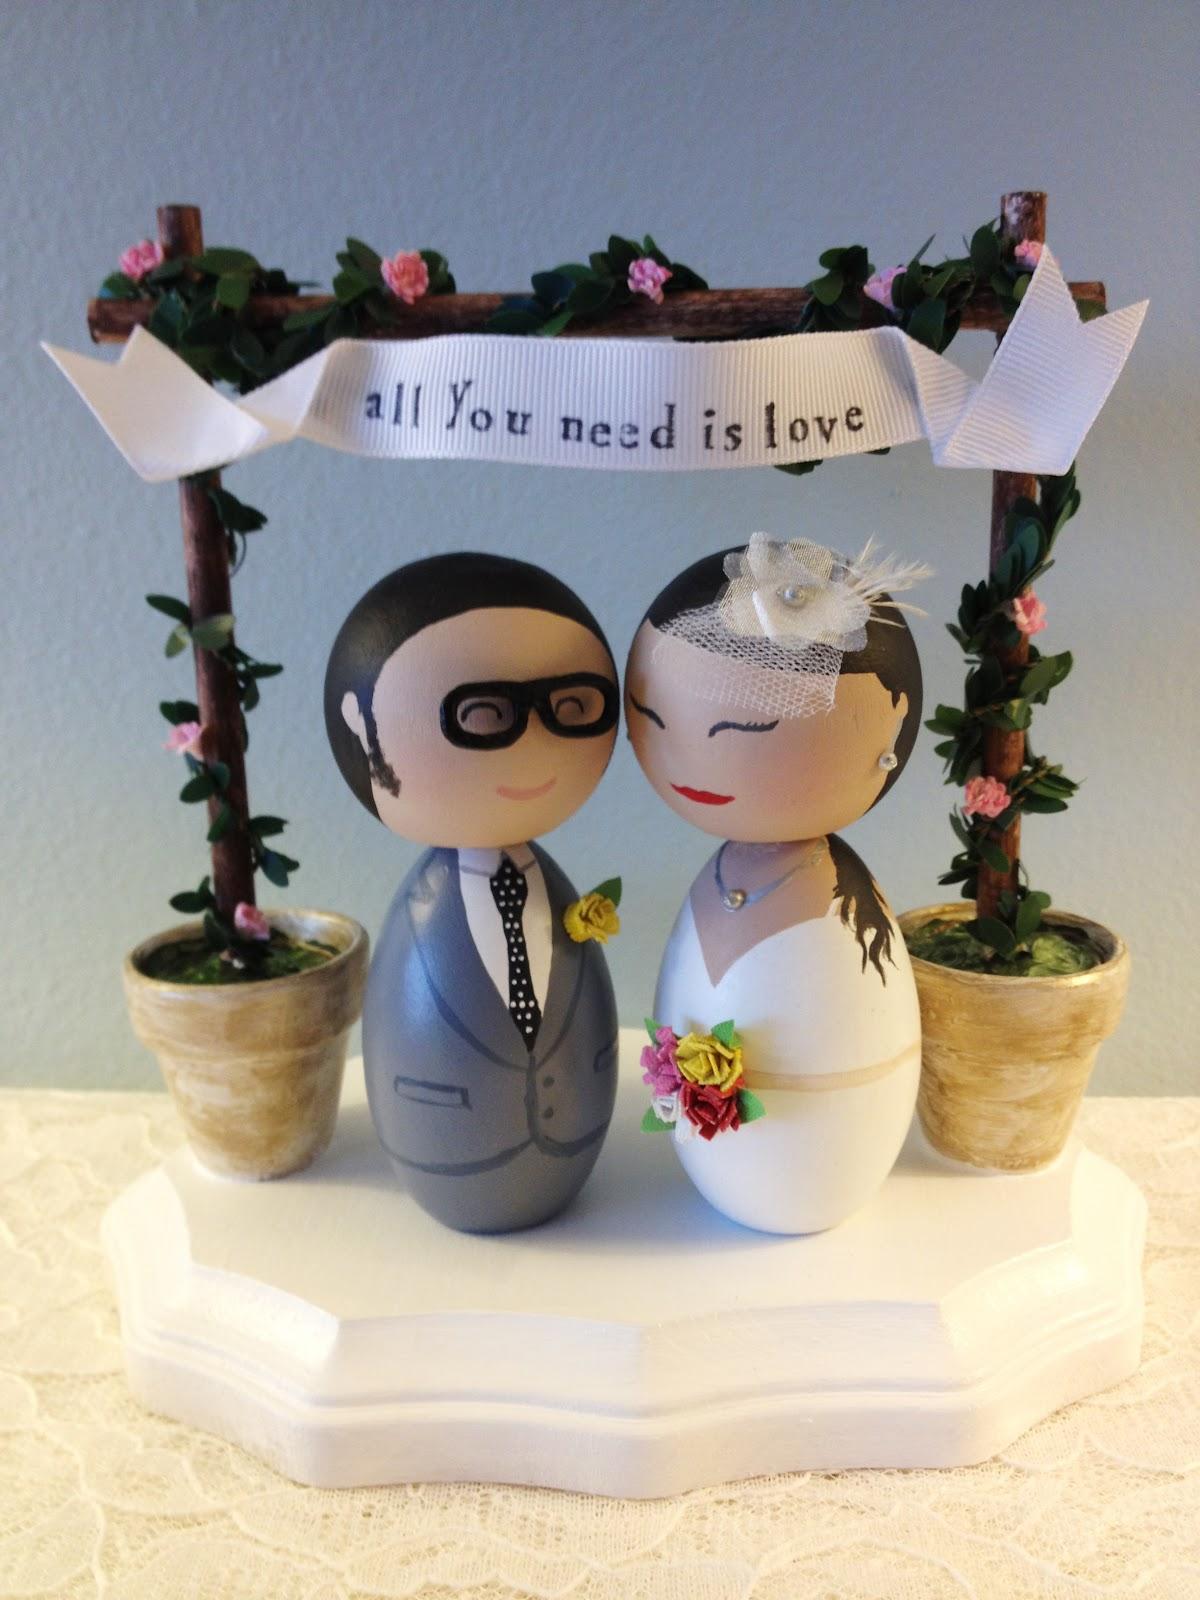 DSMeeBee Hipster Bride and Groom Wedding Cake Toppers